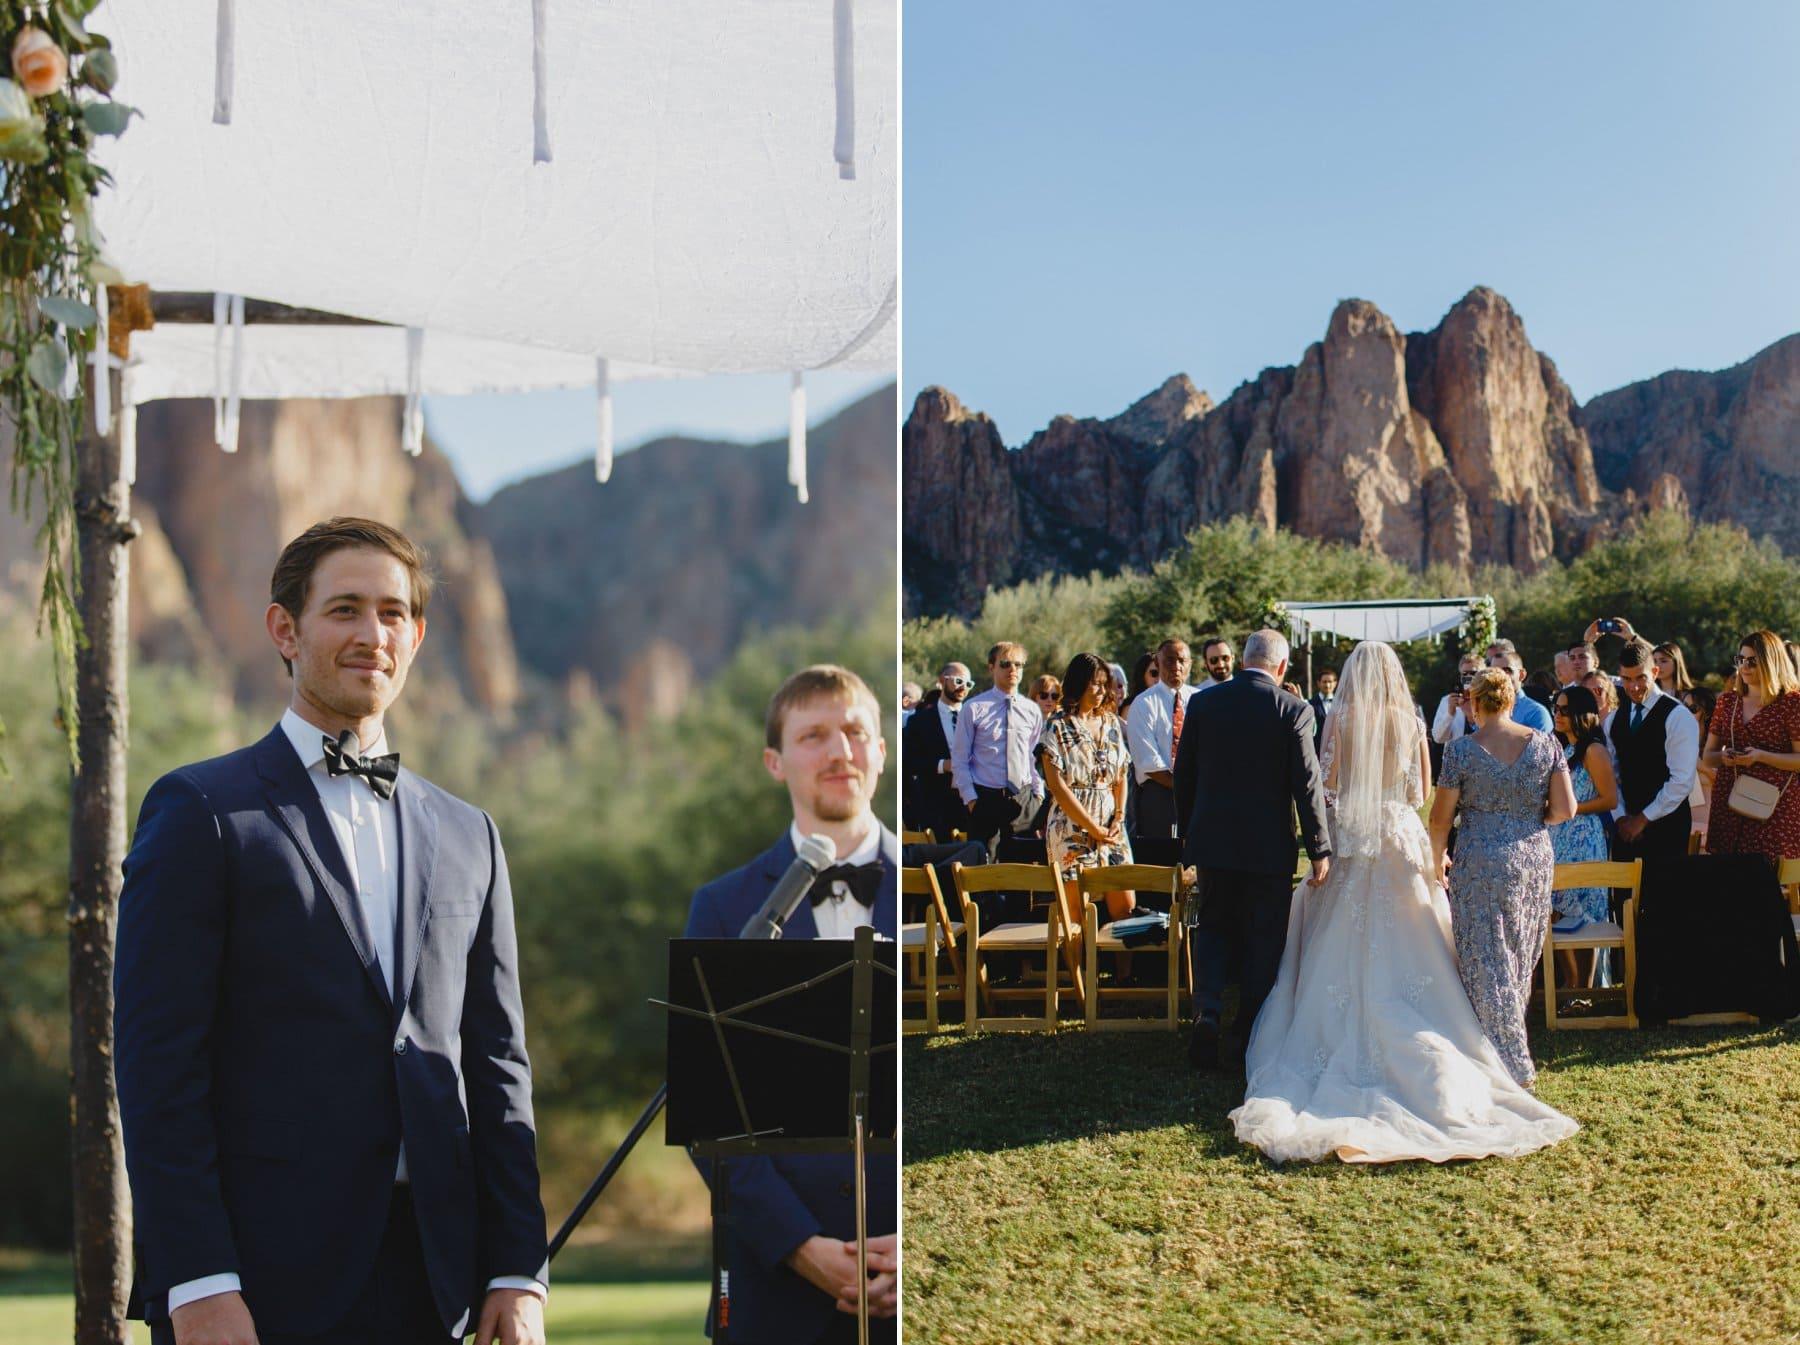 wedding ceremony at Saguaro Lake Ranch